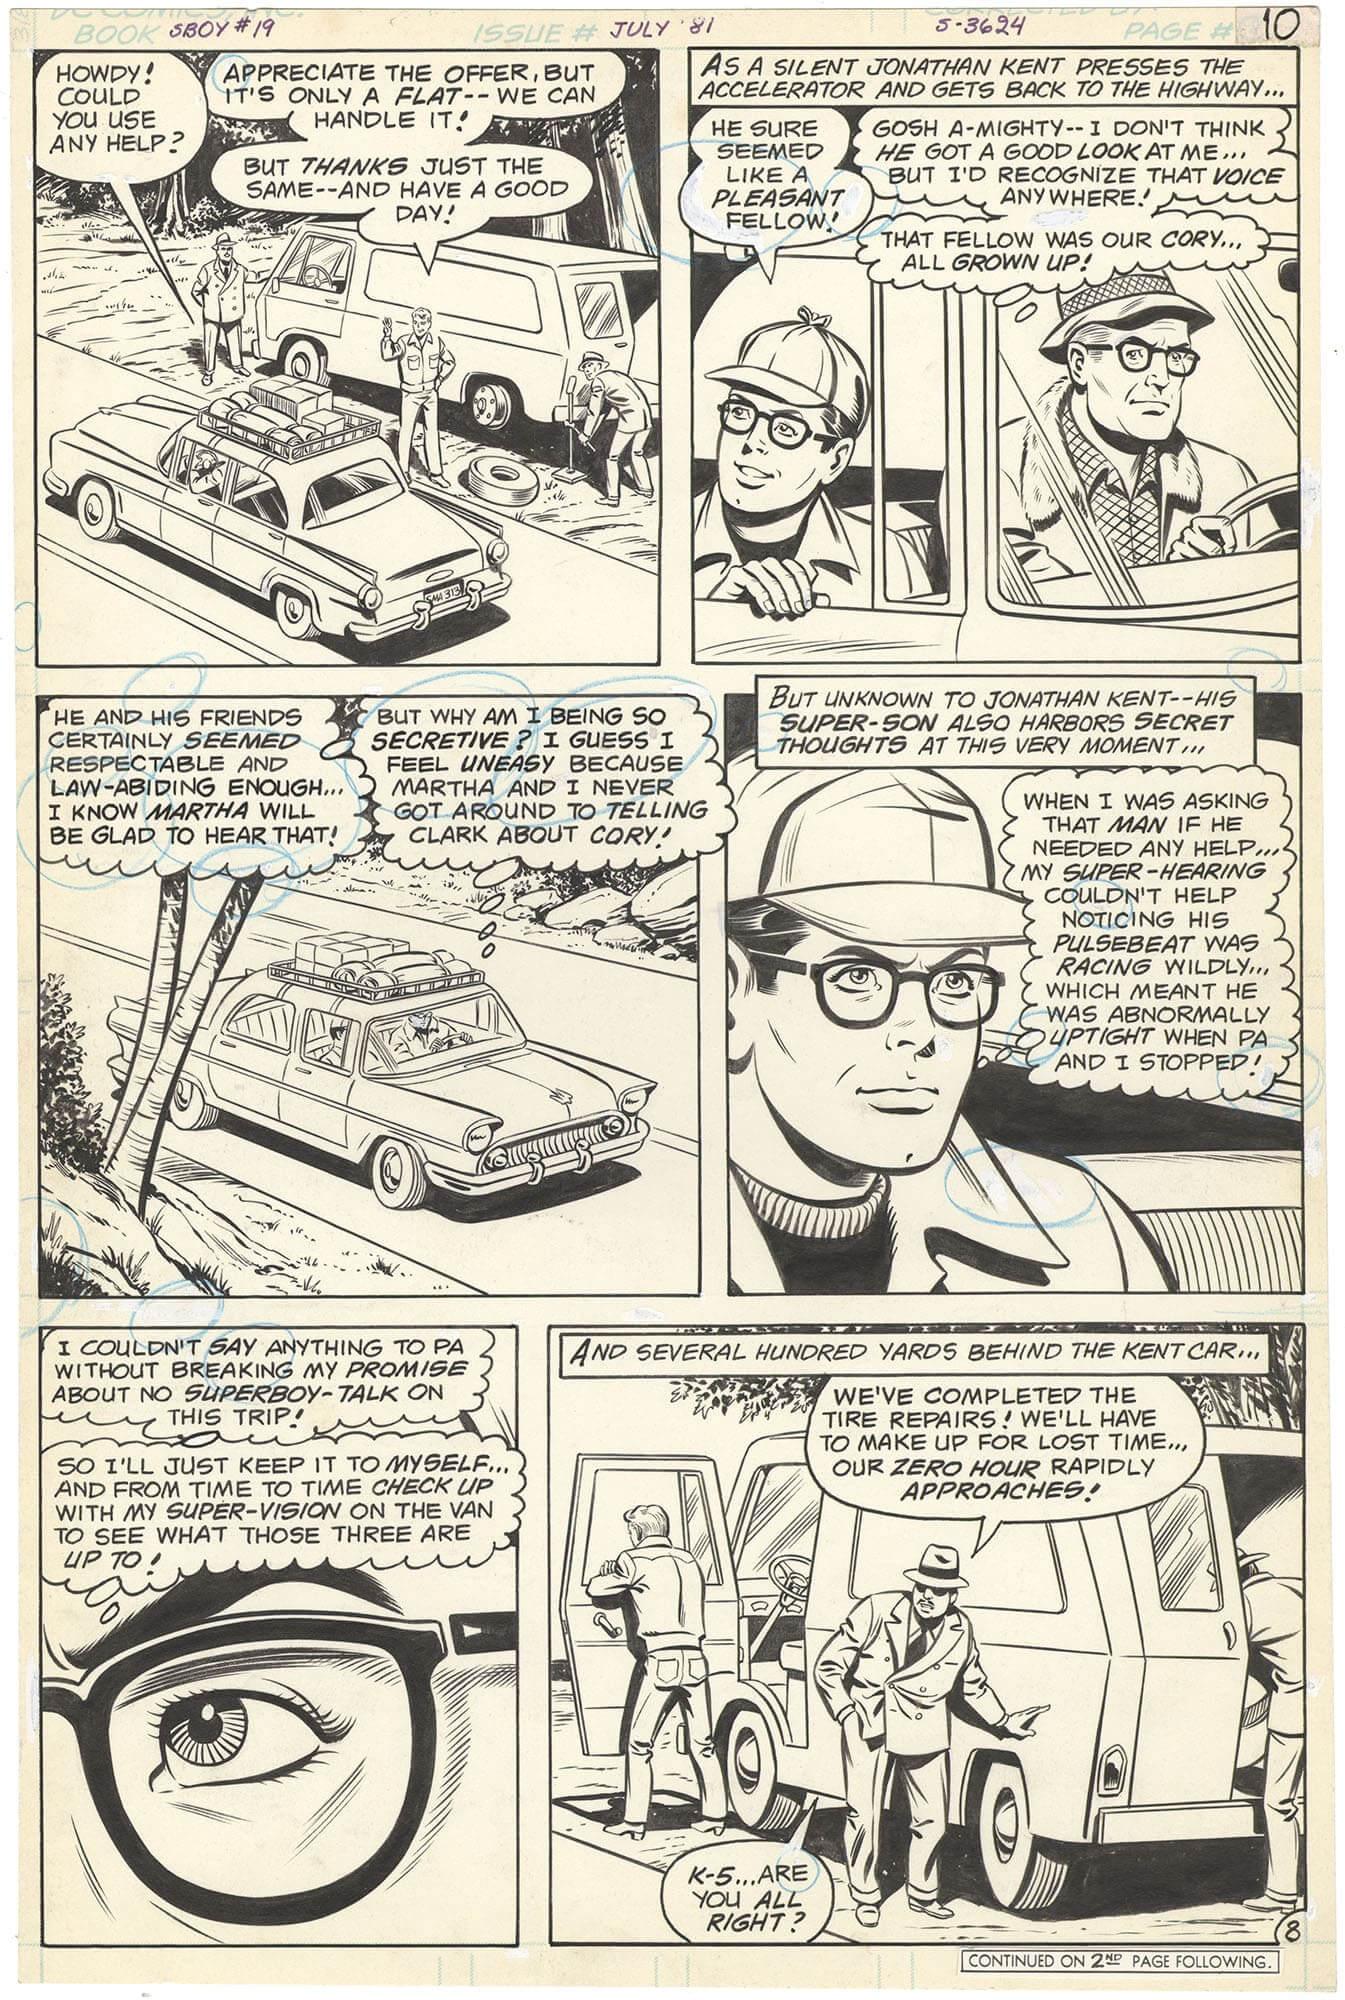 New Adventures of Superboy #19 p8